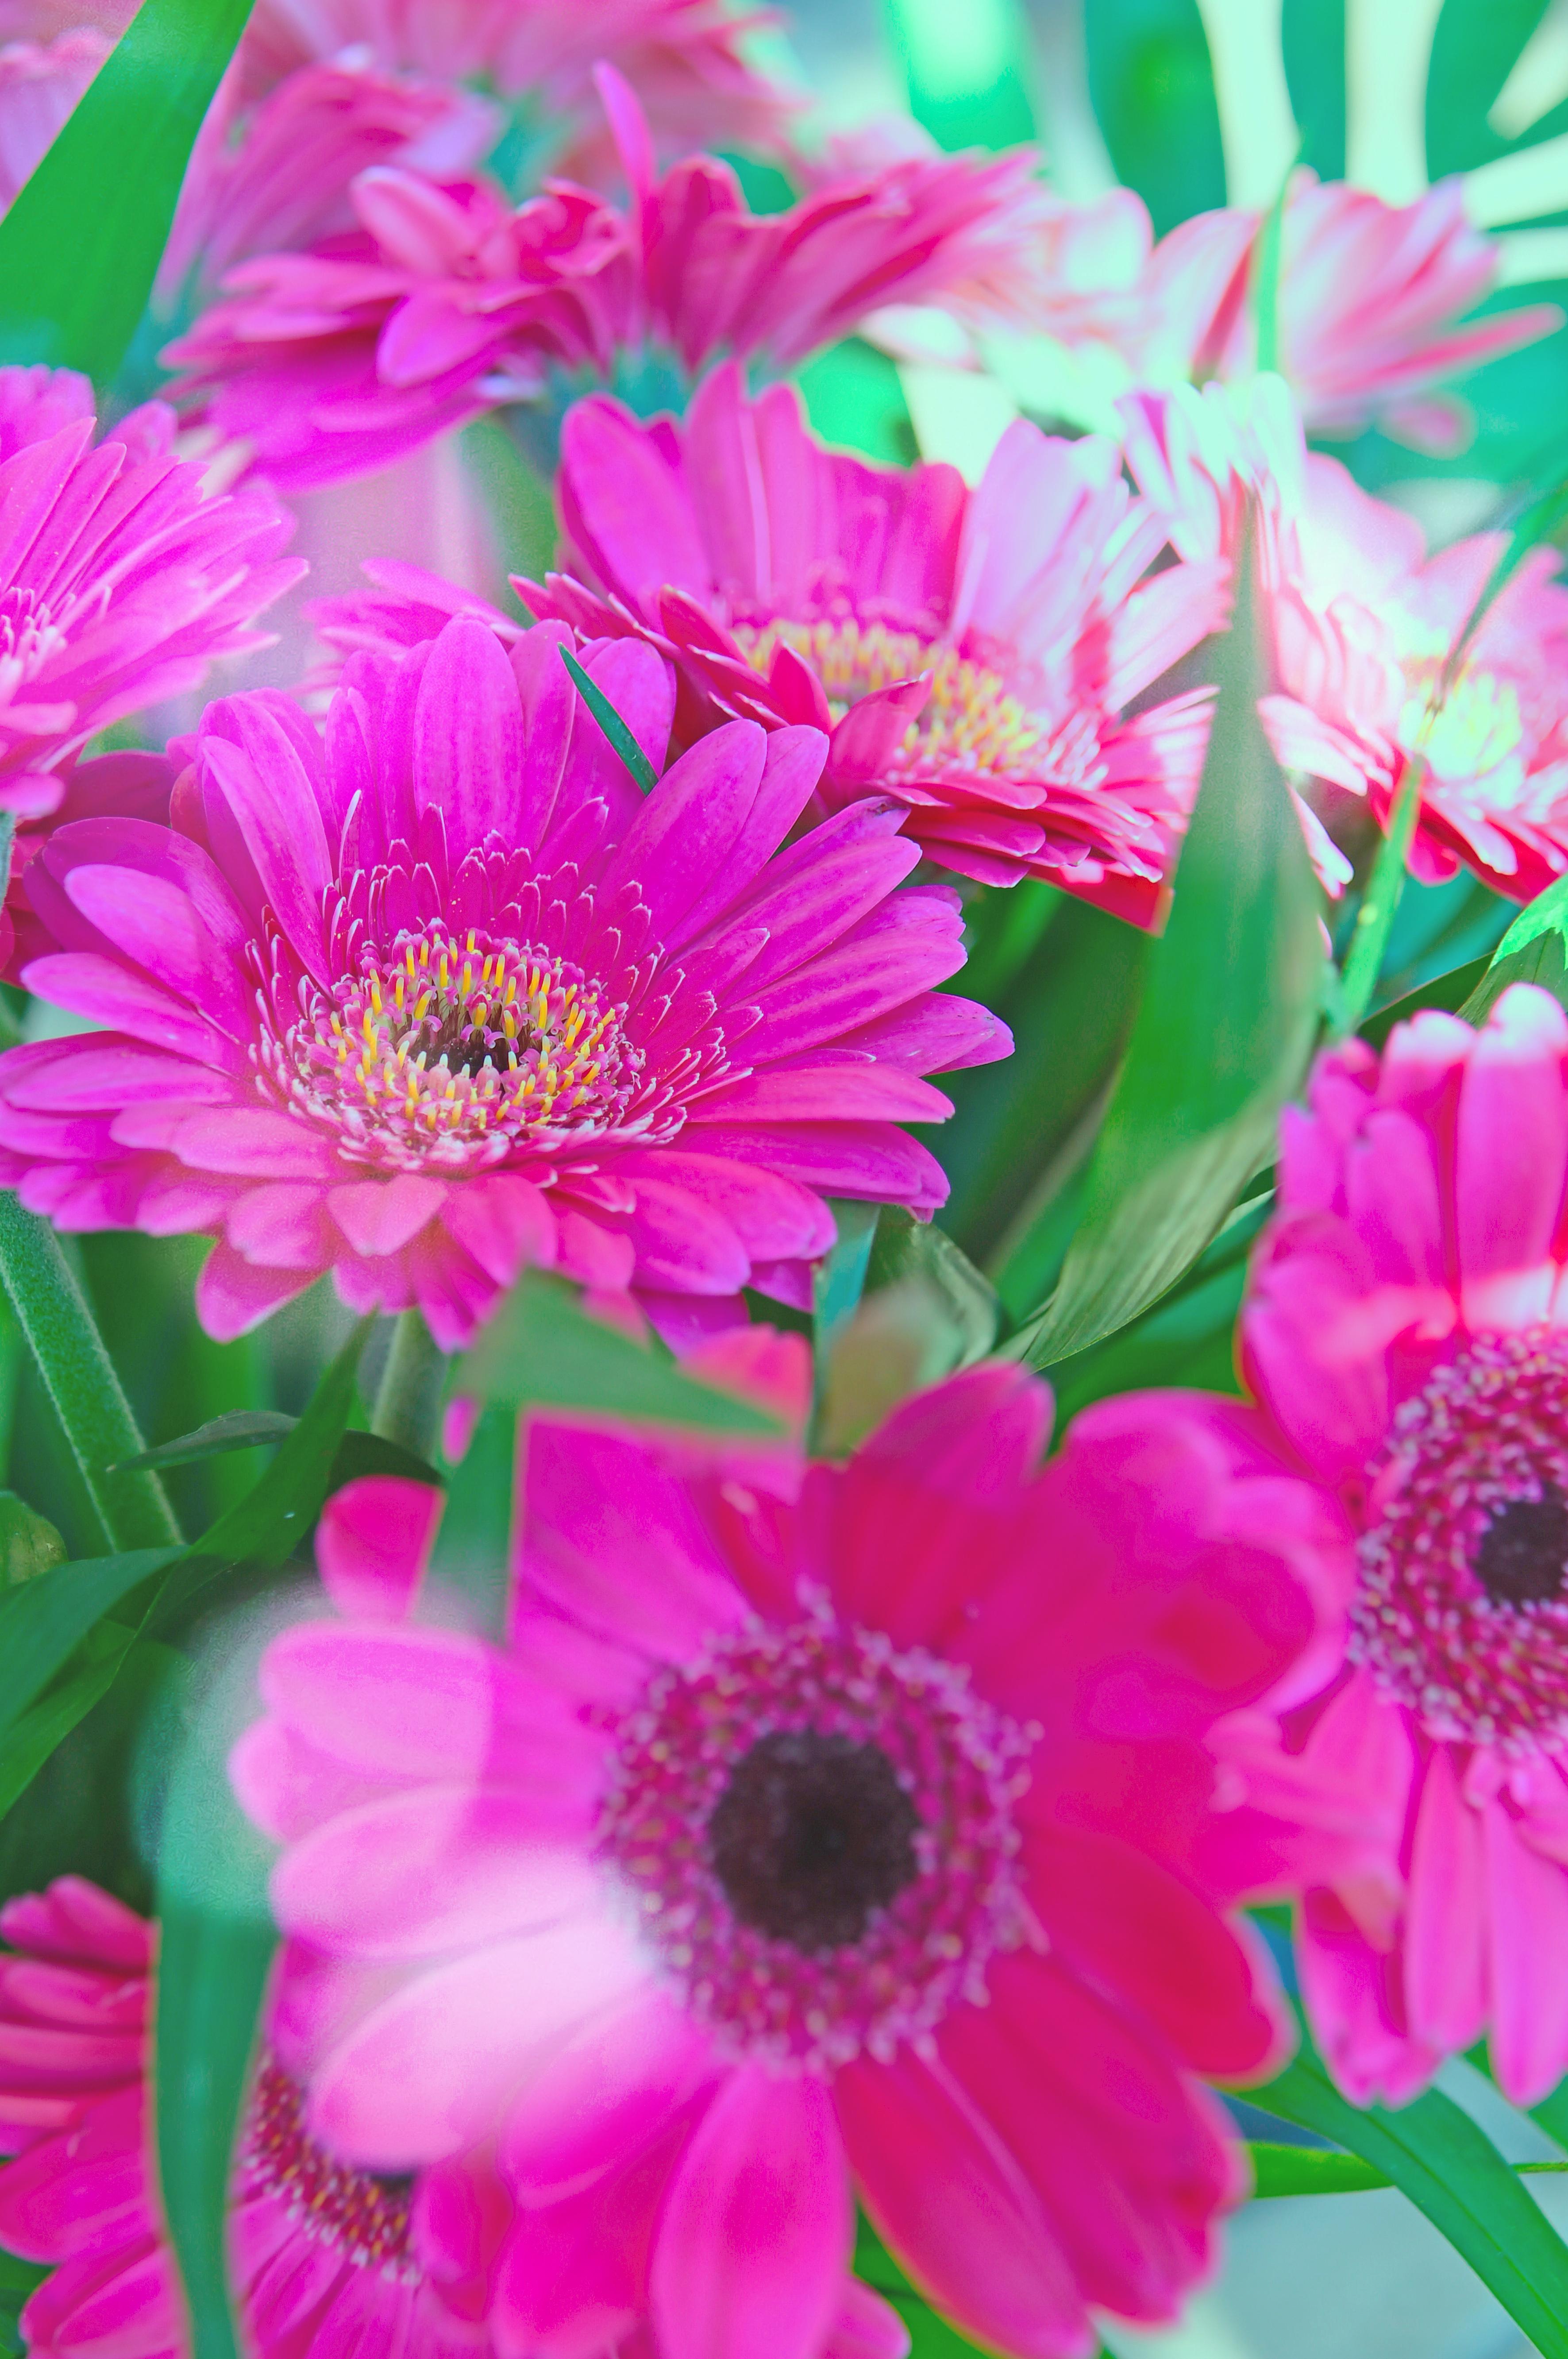 banco de imagens rosa outono fundo flor bonita natureza beleza verde colorida plantar estao flor flores vero fechar se branco fresco